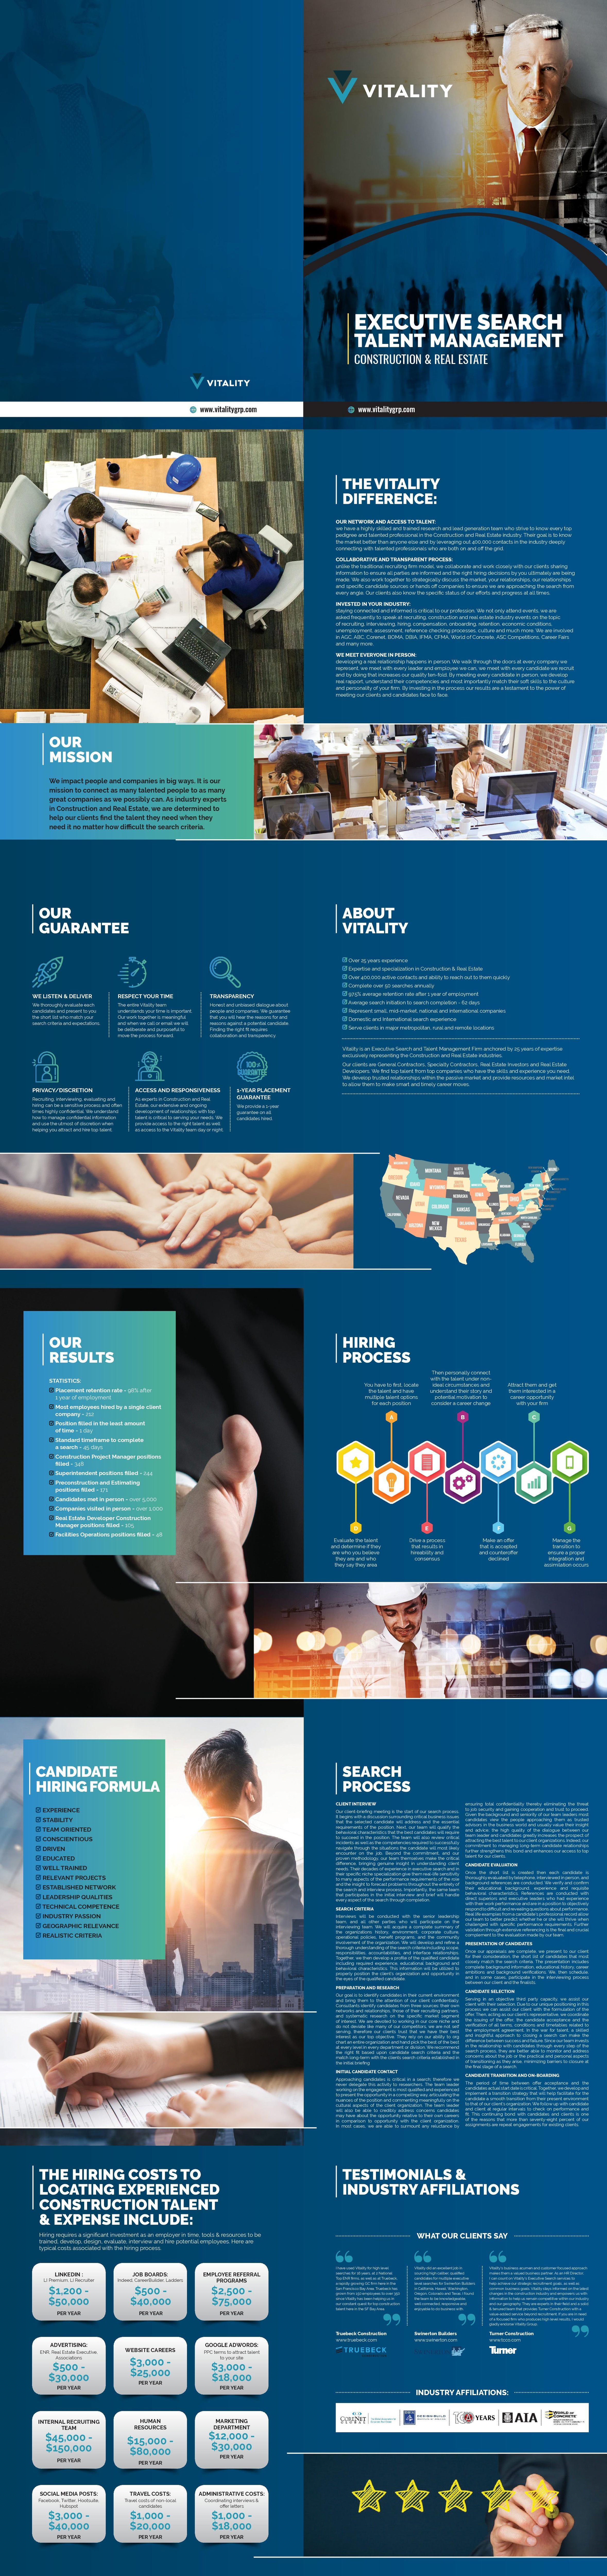 Company e-Brochure - Winning!